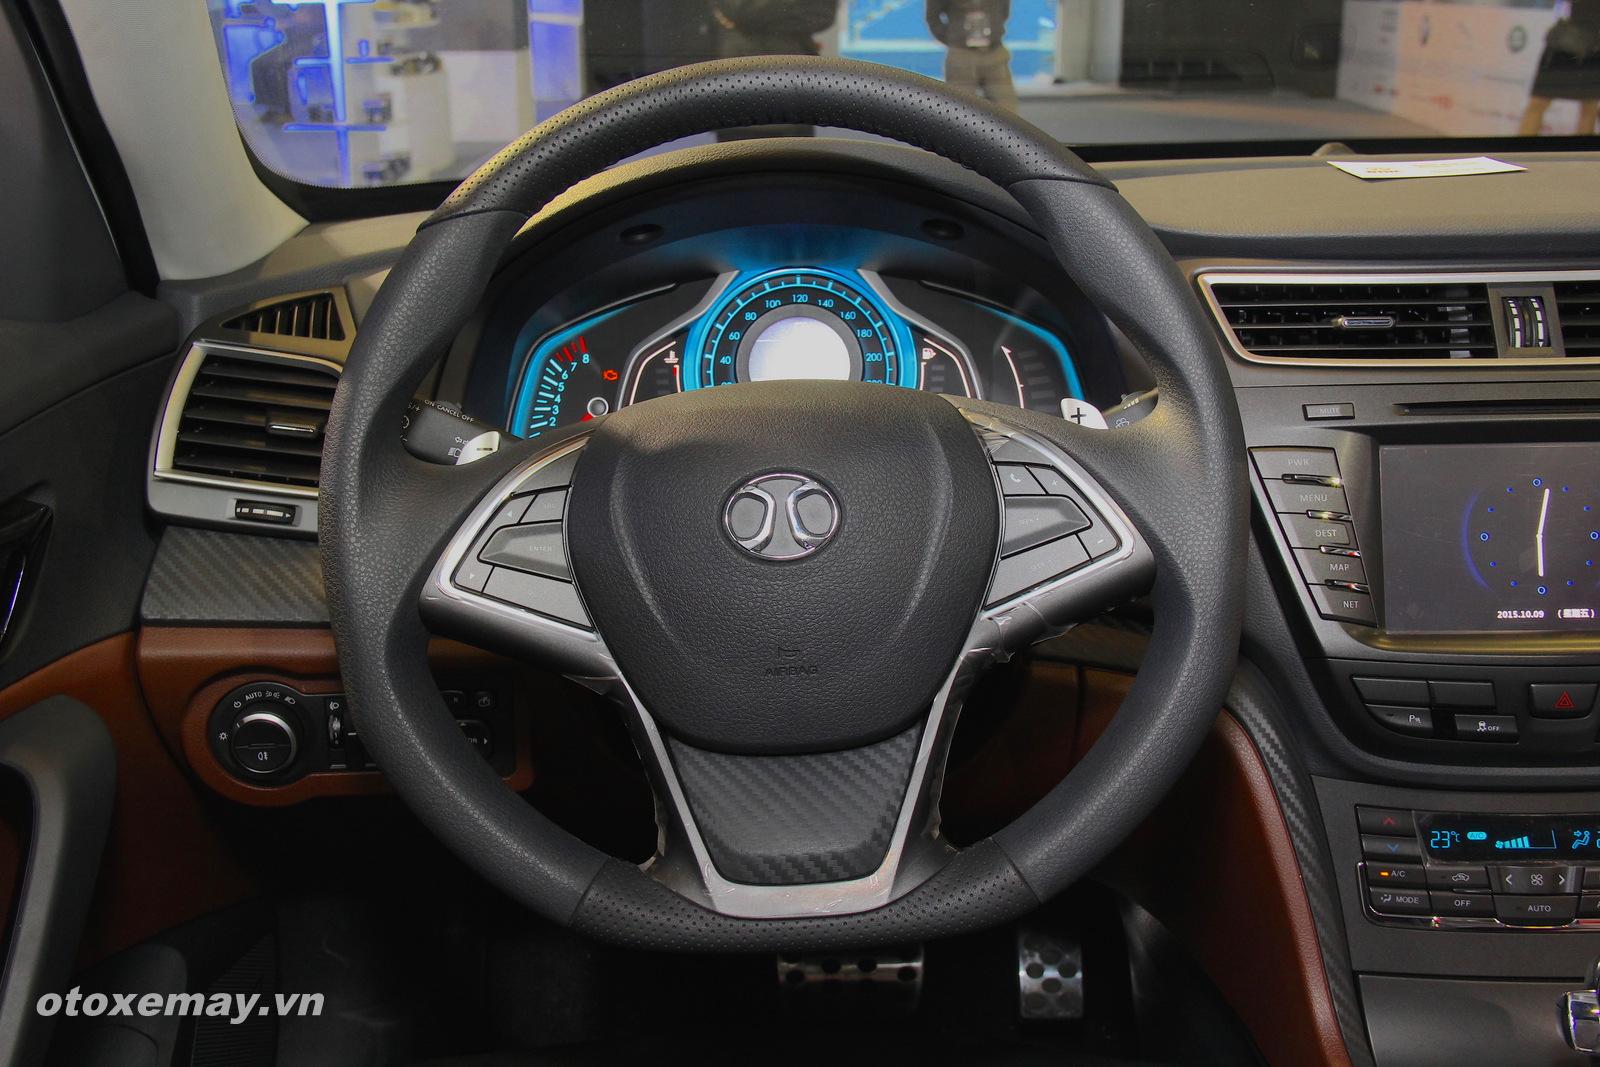 VIMS 2015: Cận cảnh sedan BAIC CC của Trung Quốc 7